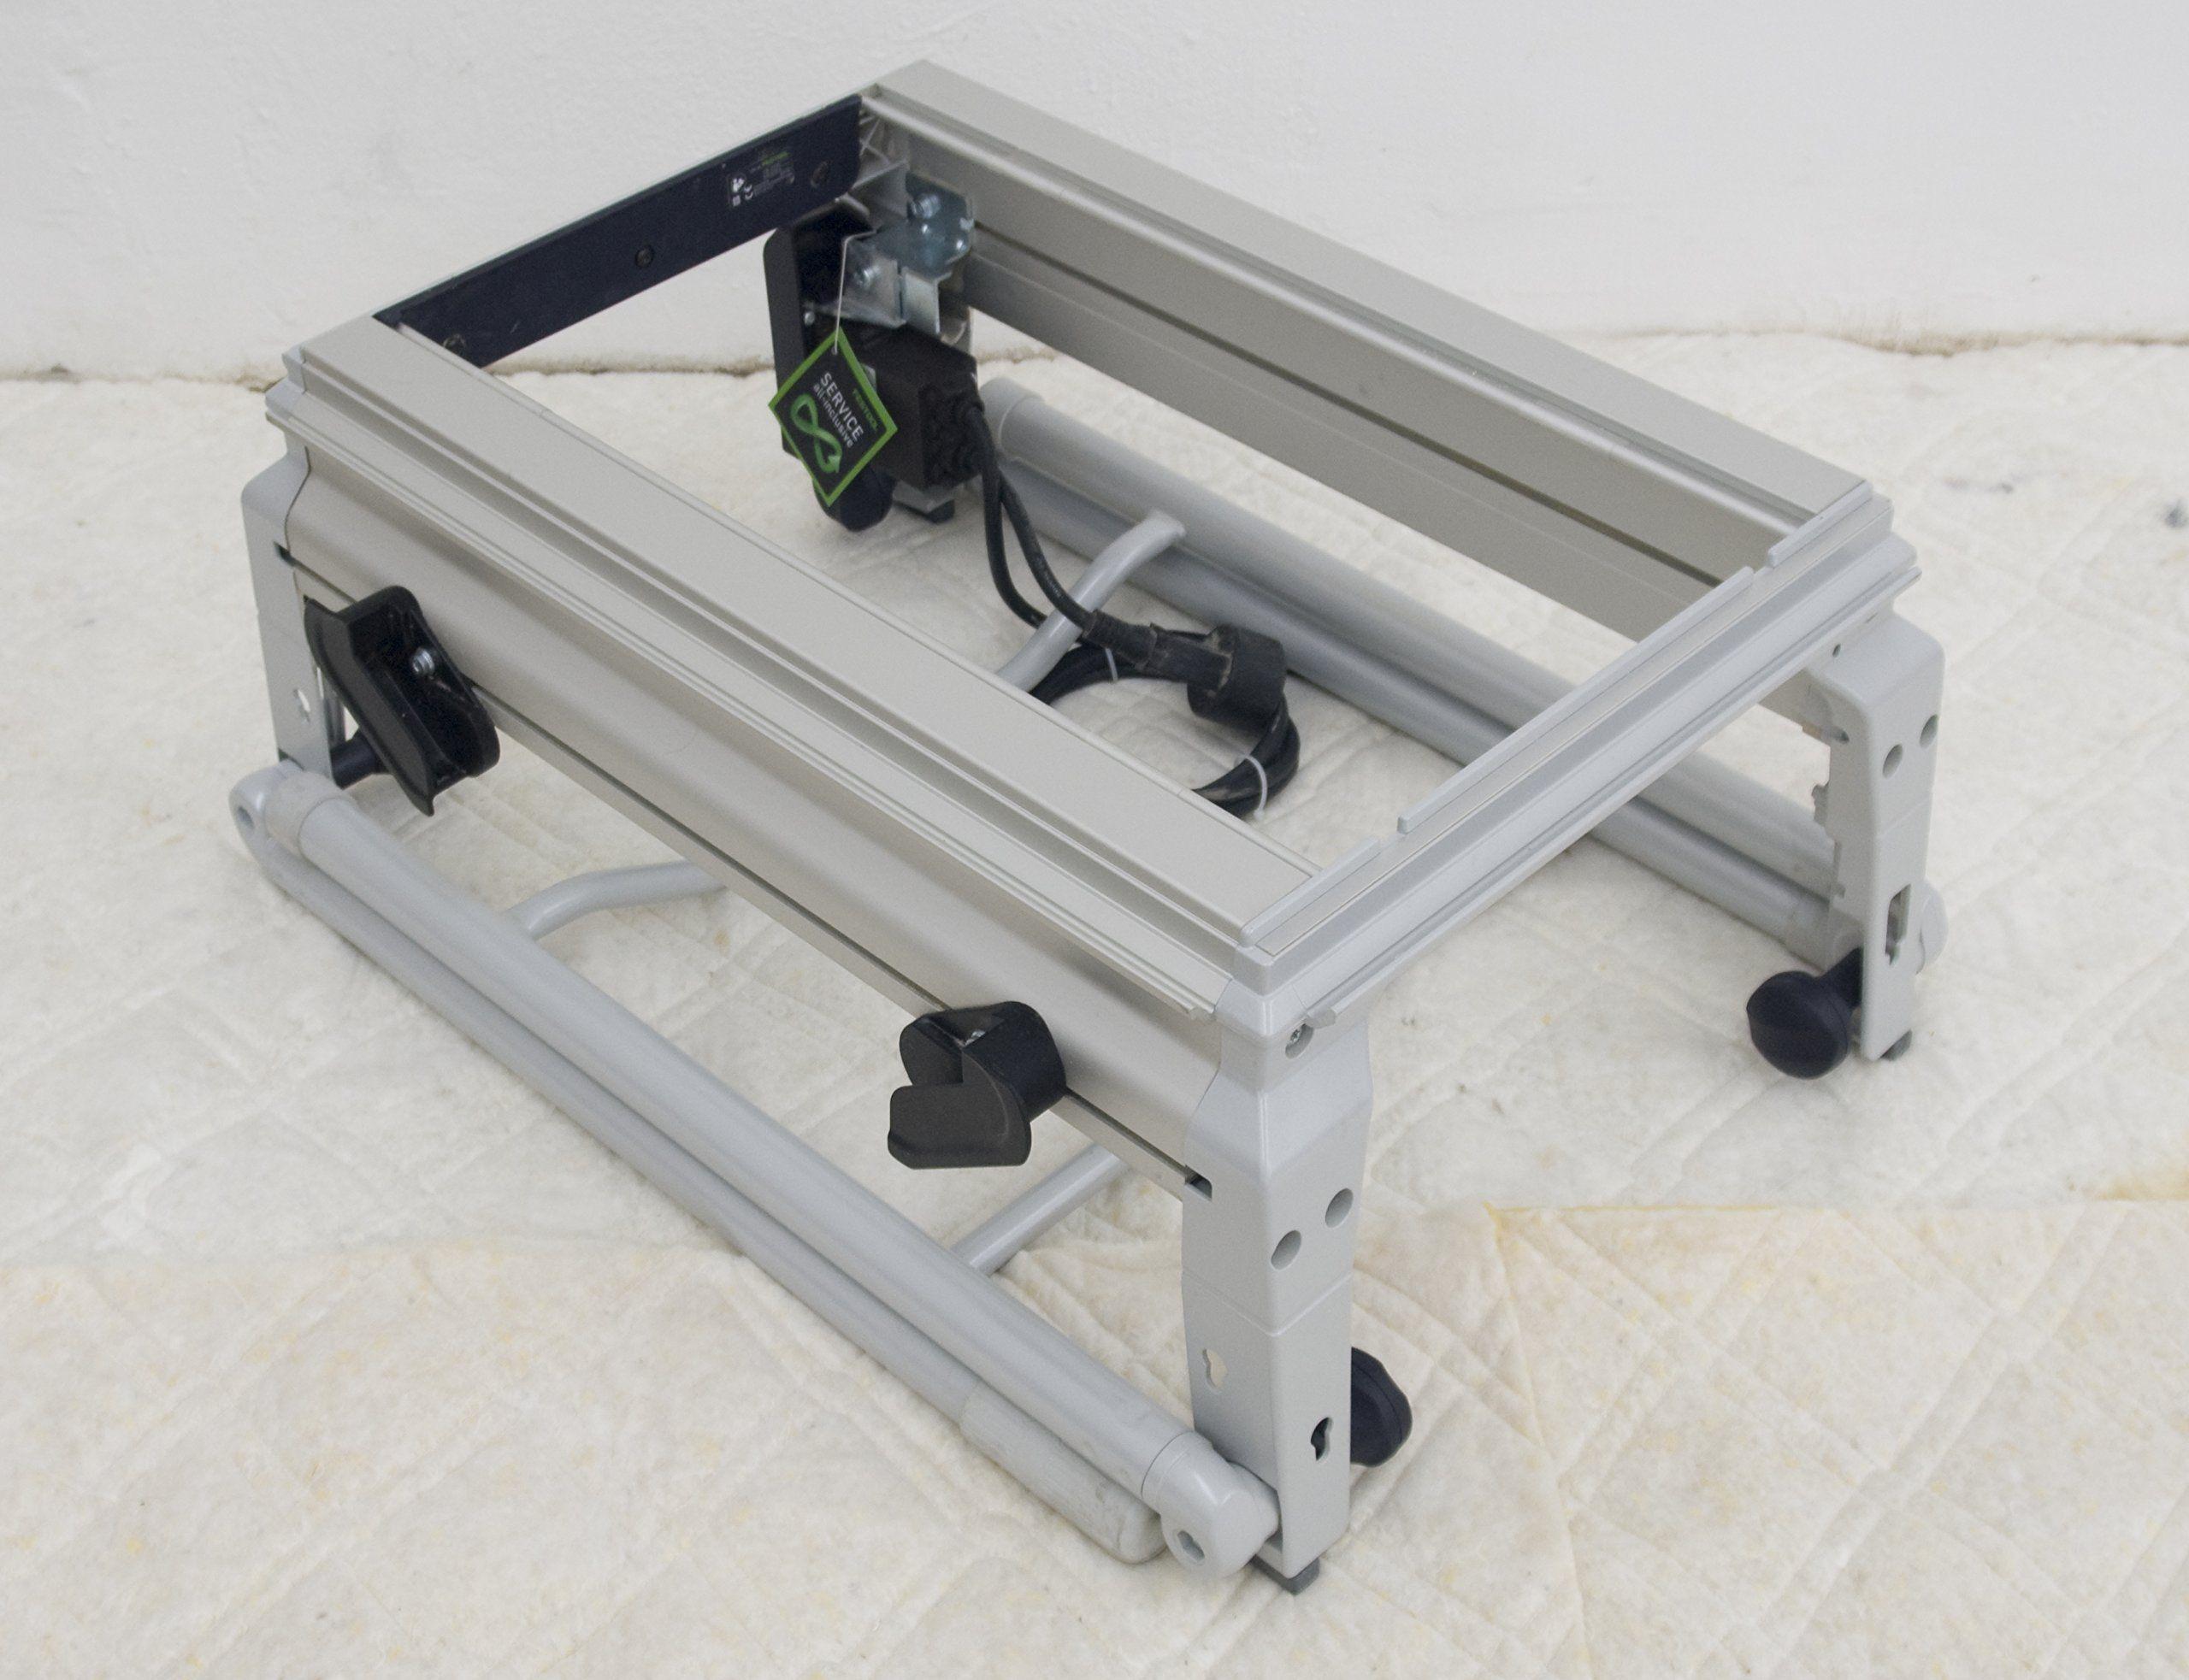 festool 561228 grundeinheit cms cms ge baumarkt workspace pinterest. Black Bedroom Furniture Sets. Home Design Ideas